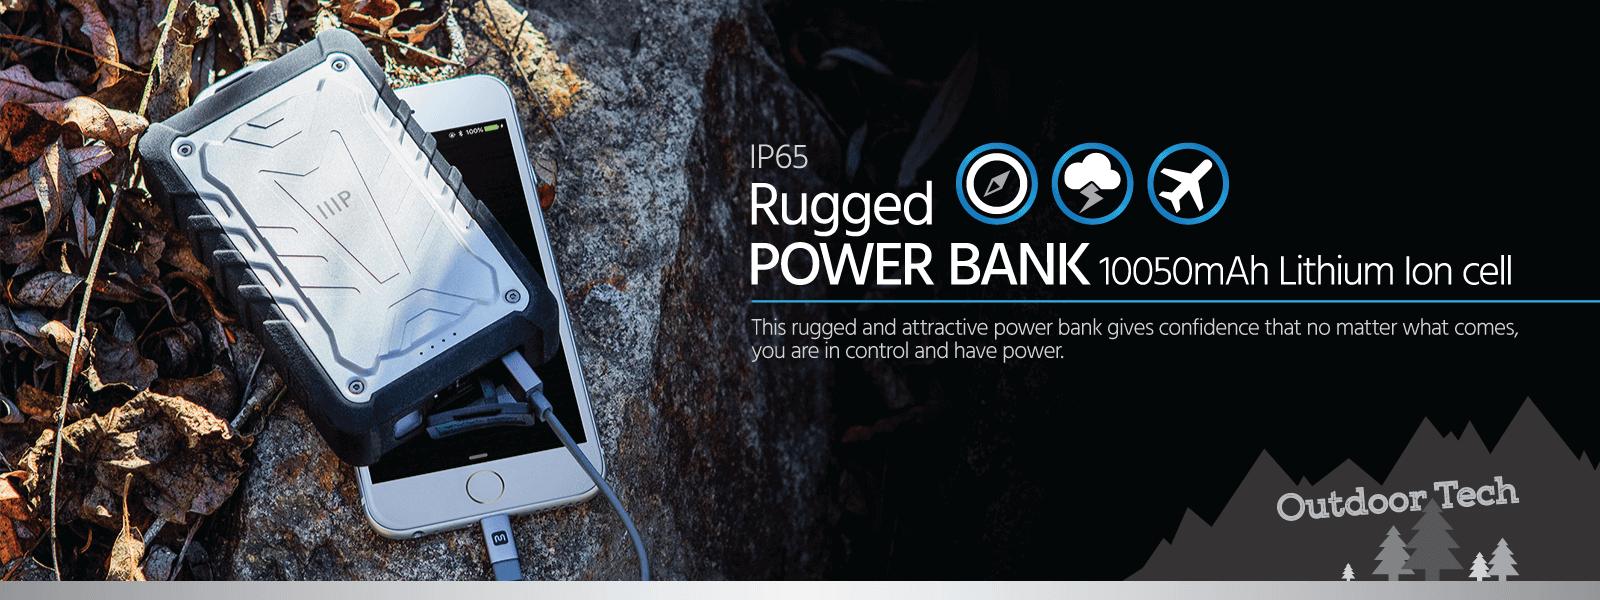 Rugged Power Bank